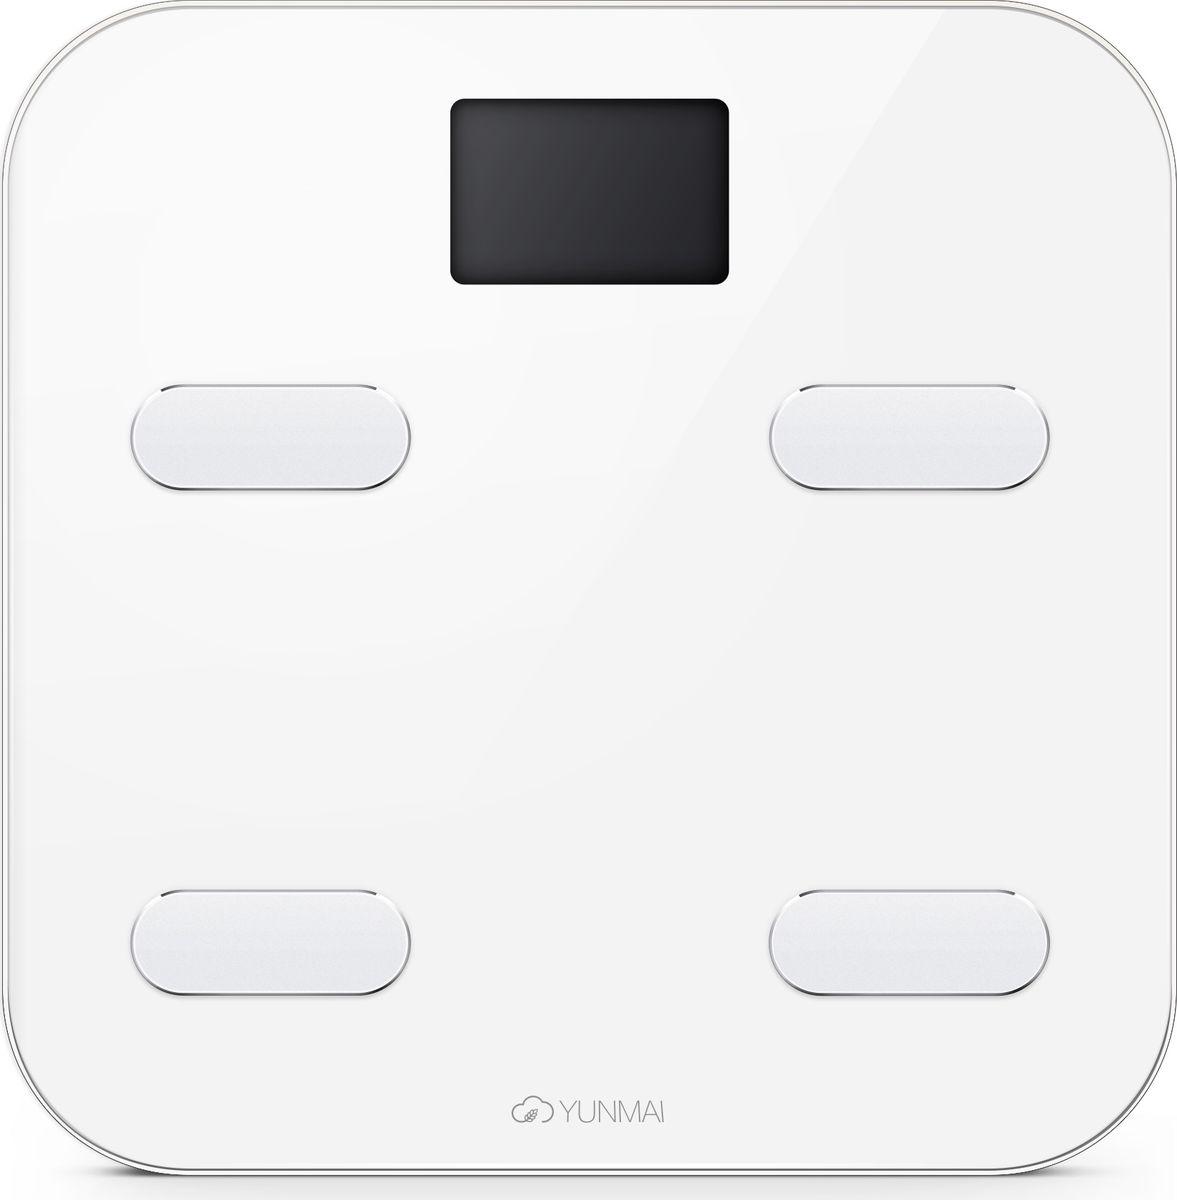 Напольные весы Yunmai Color, White